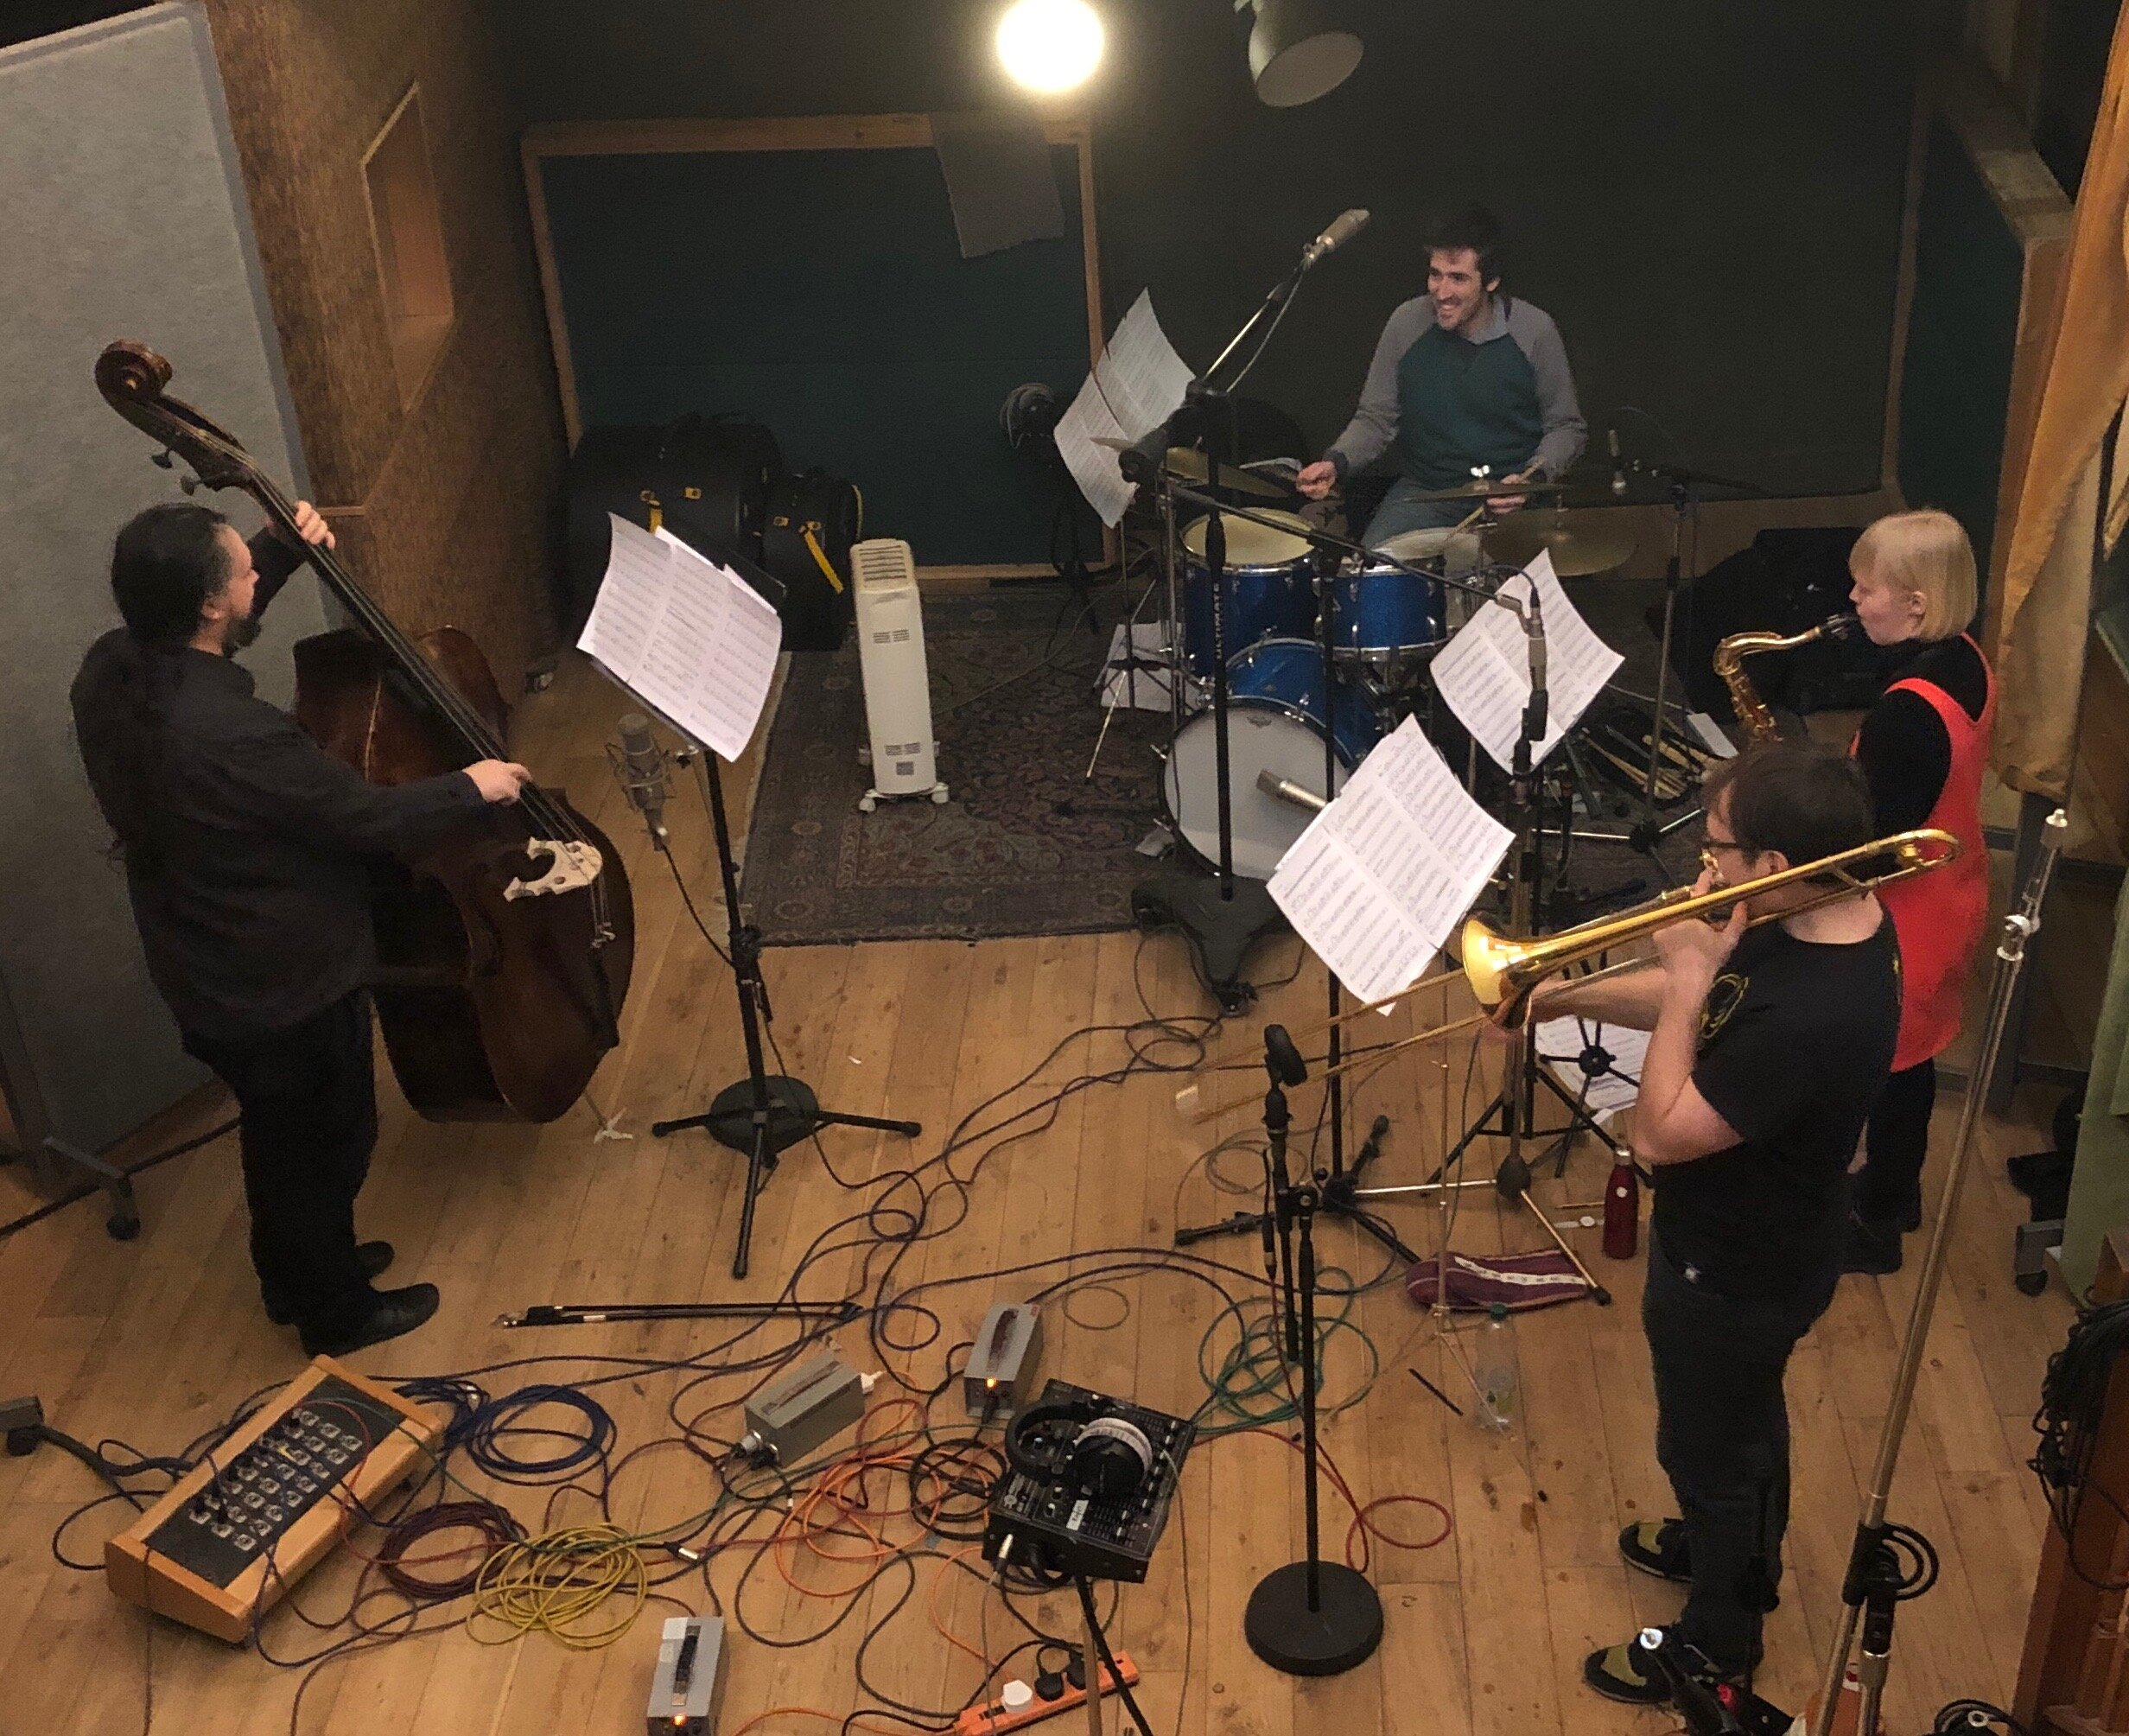 Left to right: Calum Gourlay, James Maddren, Kieran McLeod, Helena Kay.